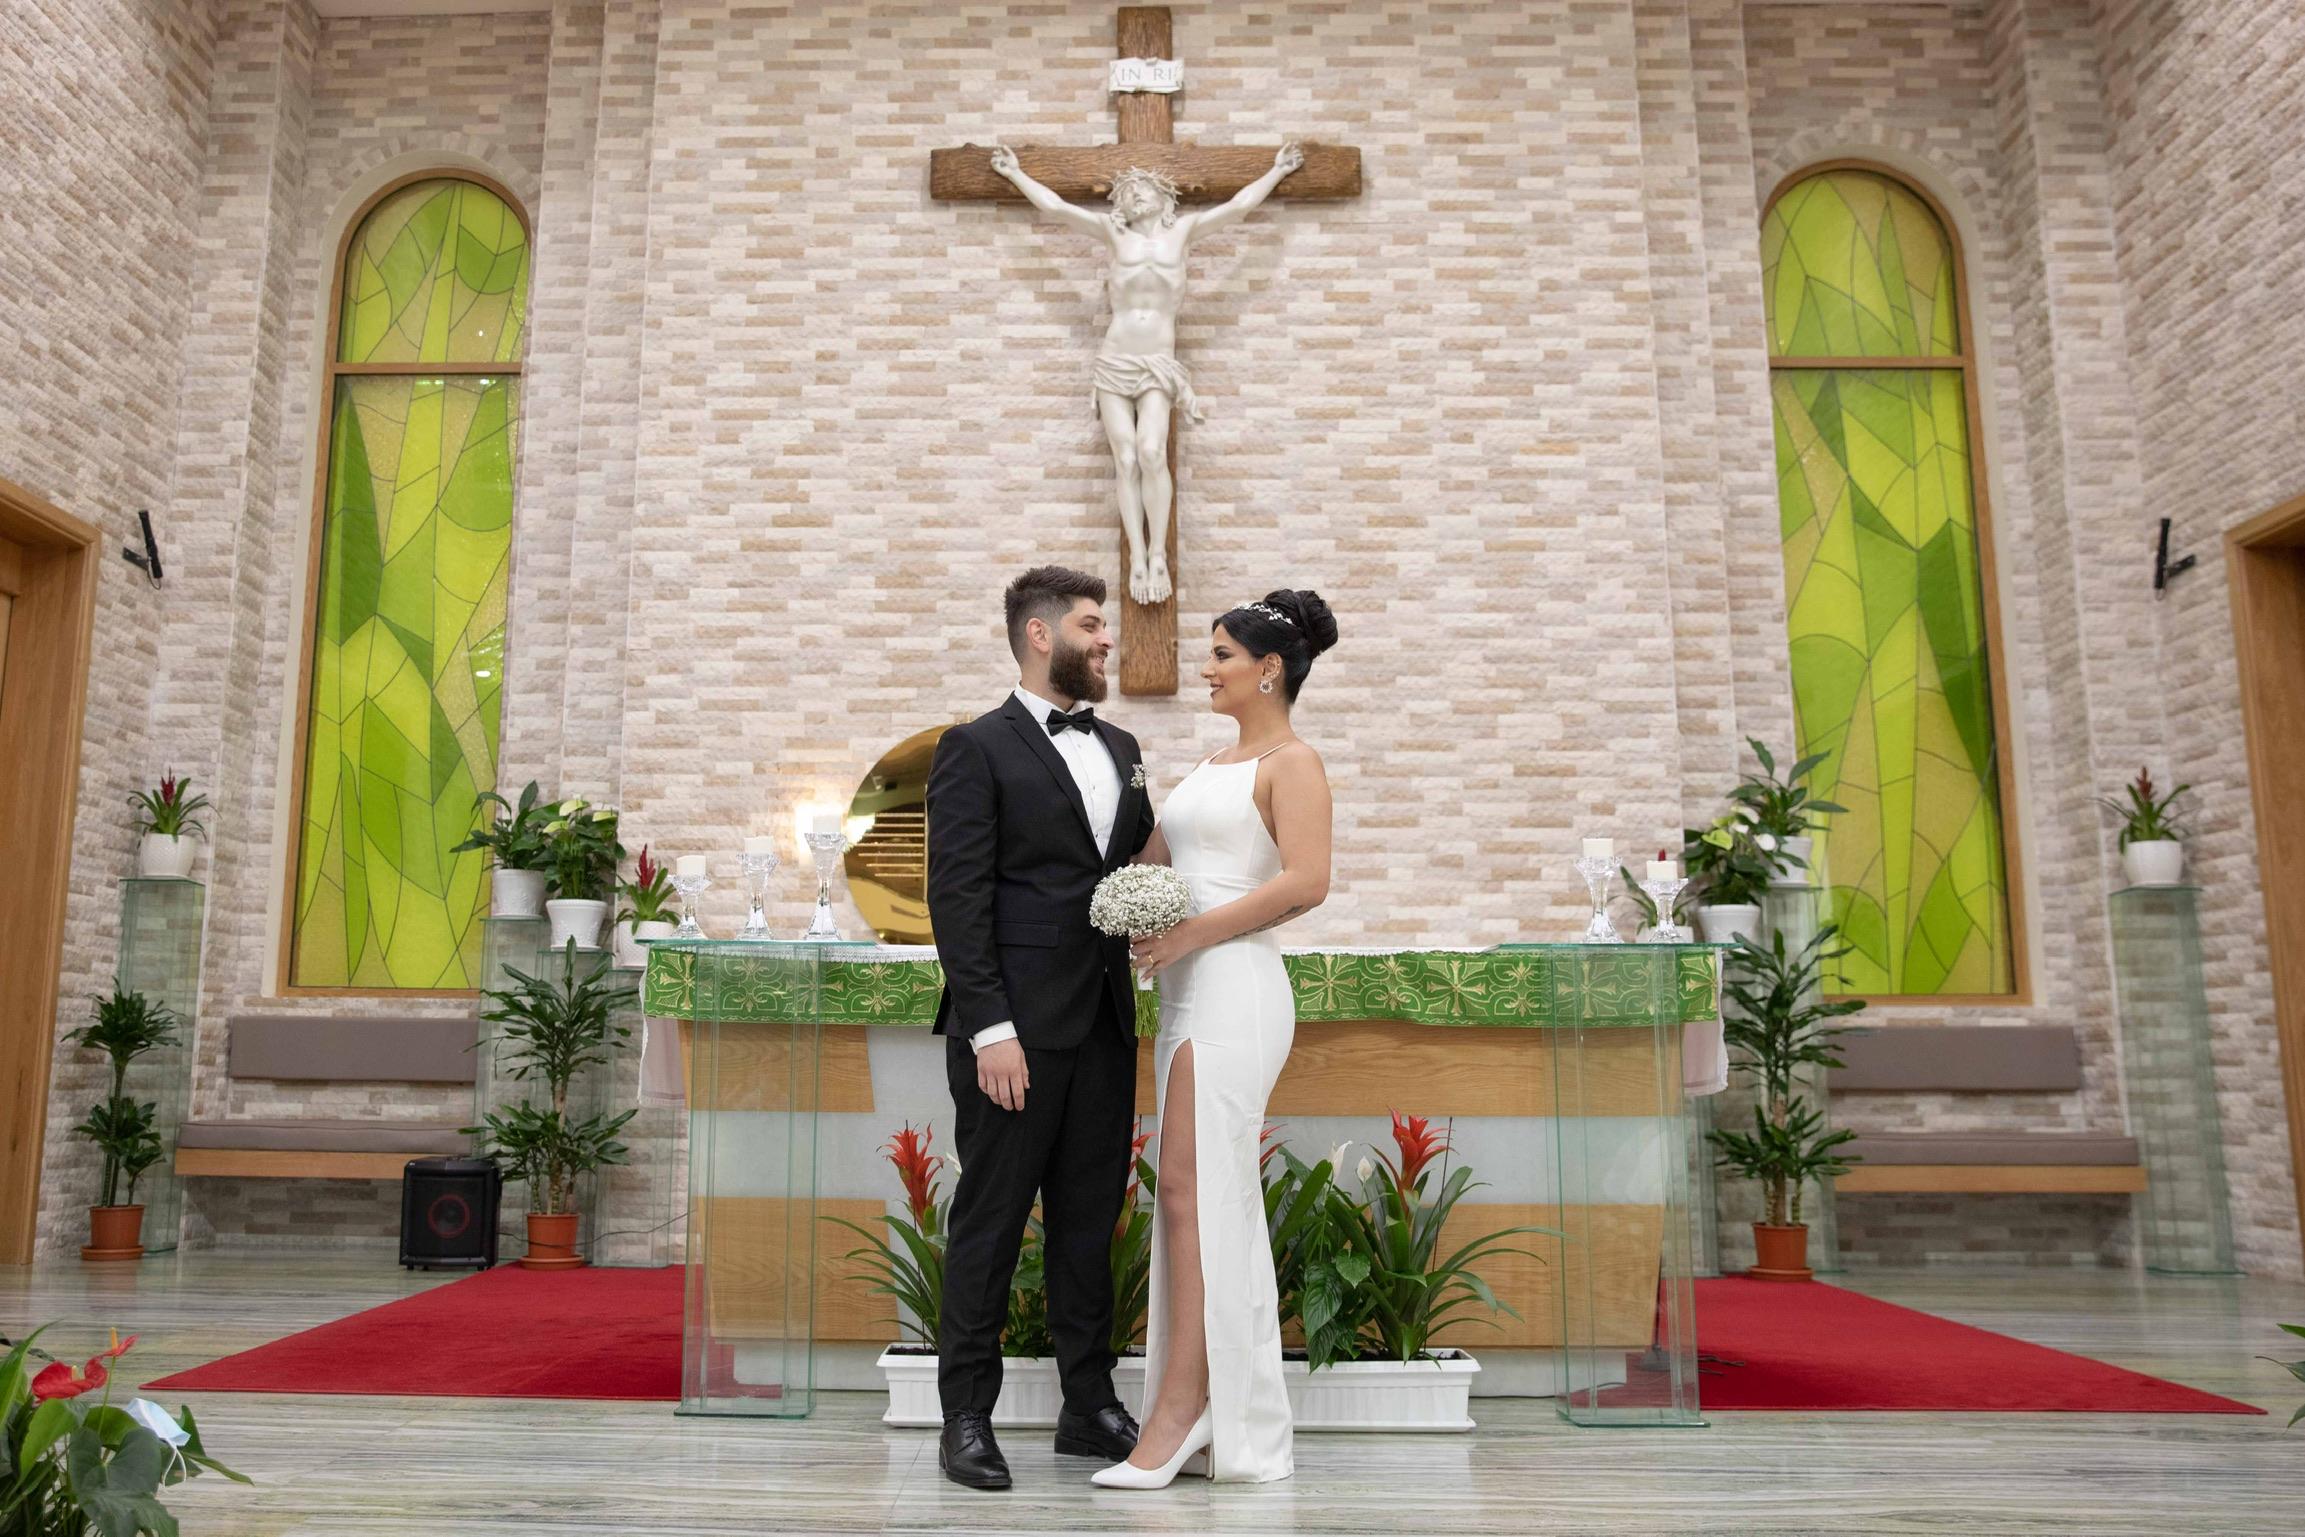 Abu Dhabi based wedding 3